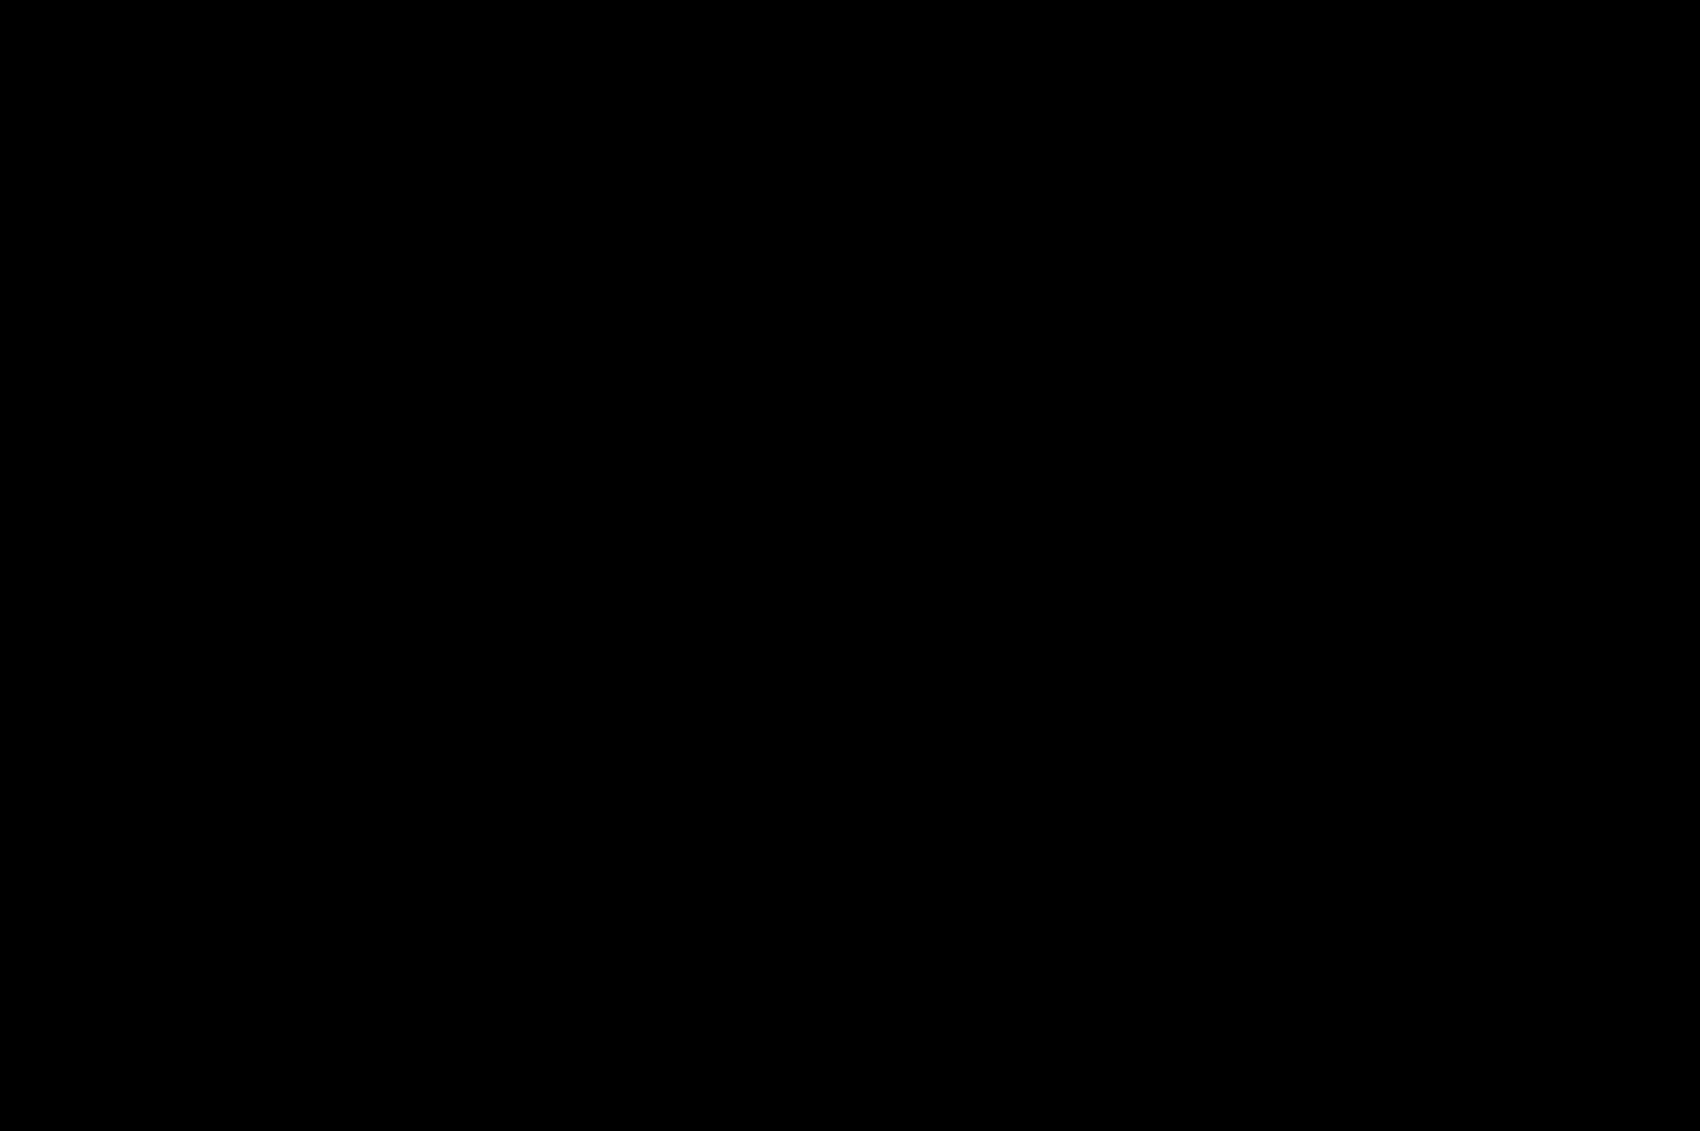 cbg.jpg